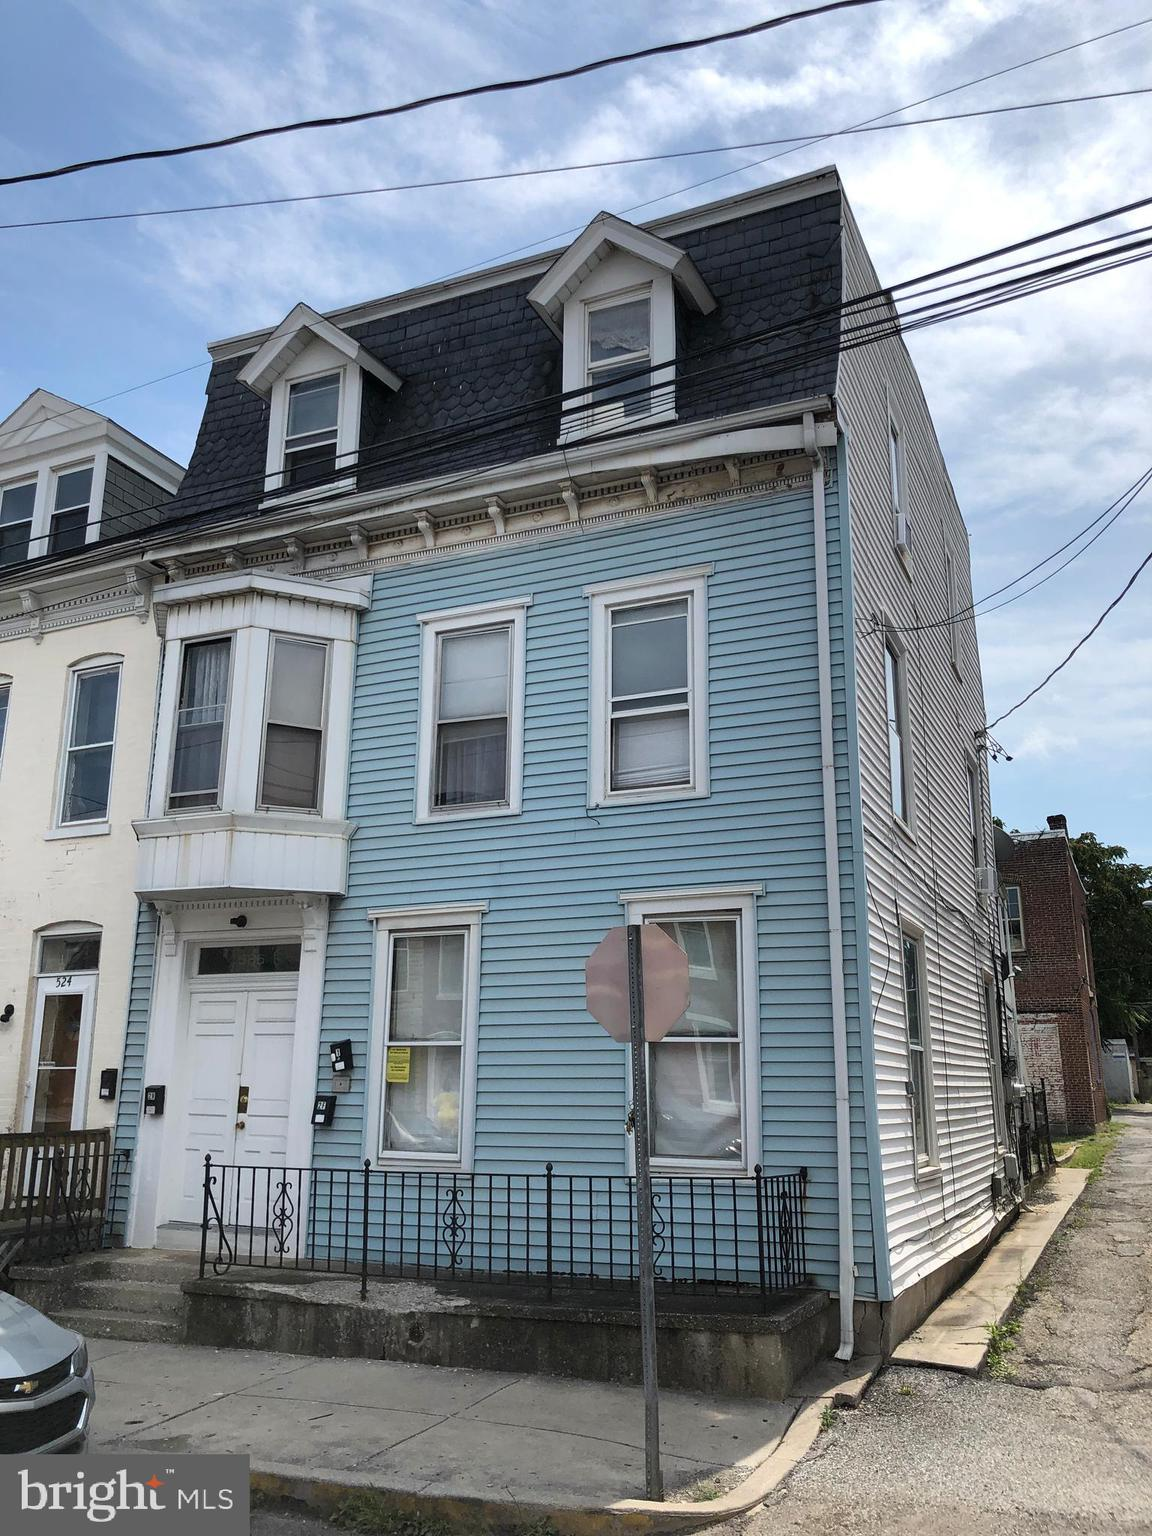 526 W PHILADELPHIA STREET, YORK, PA 17401